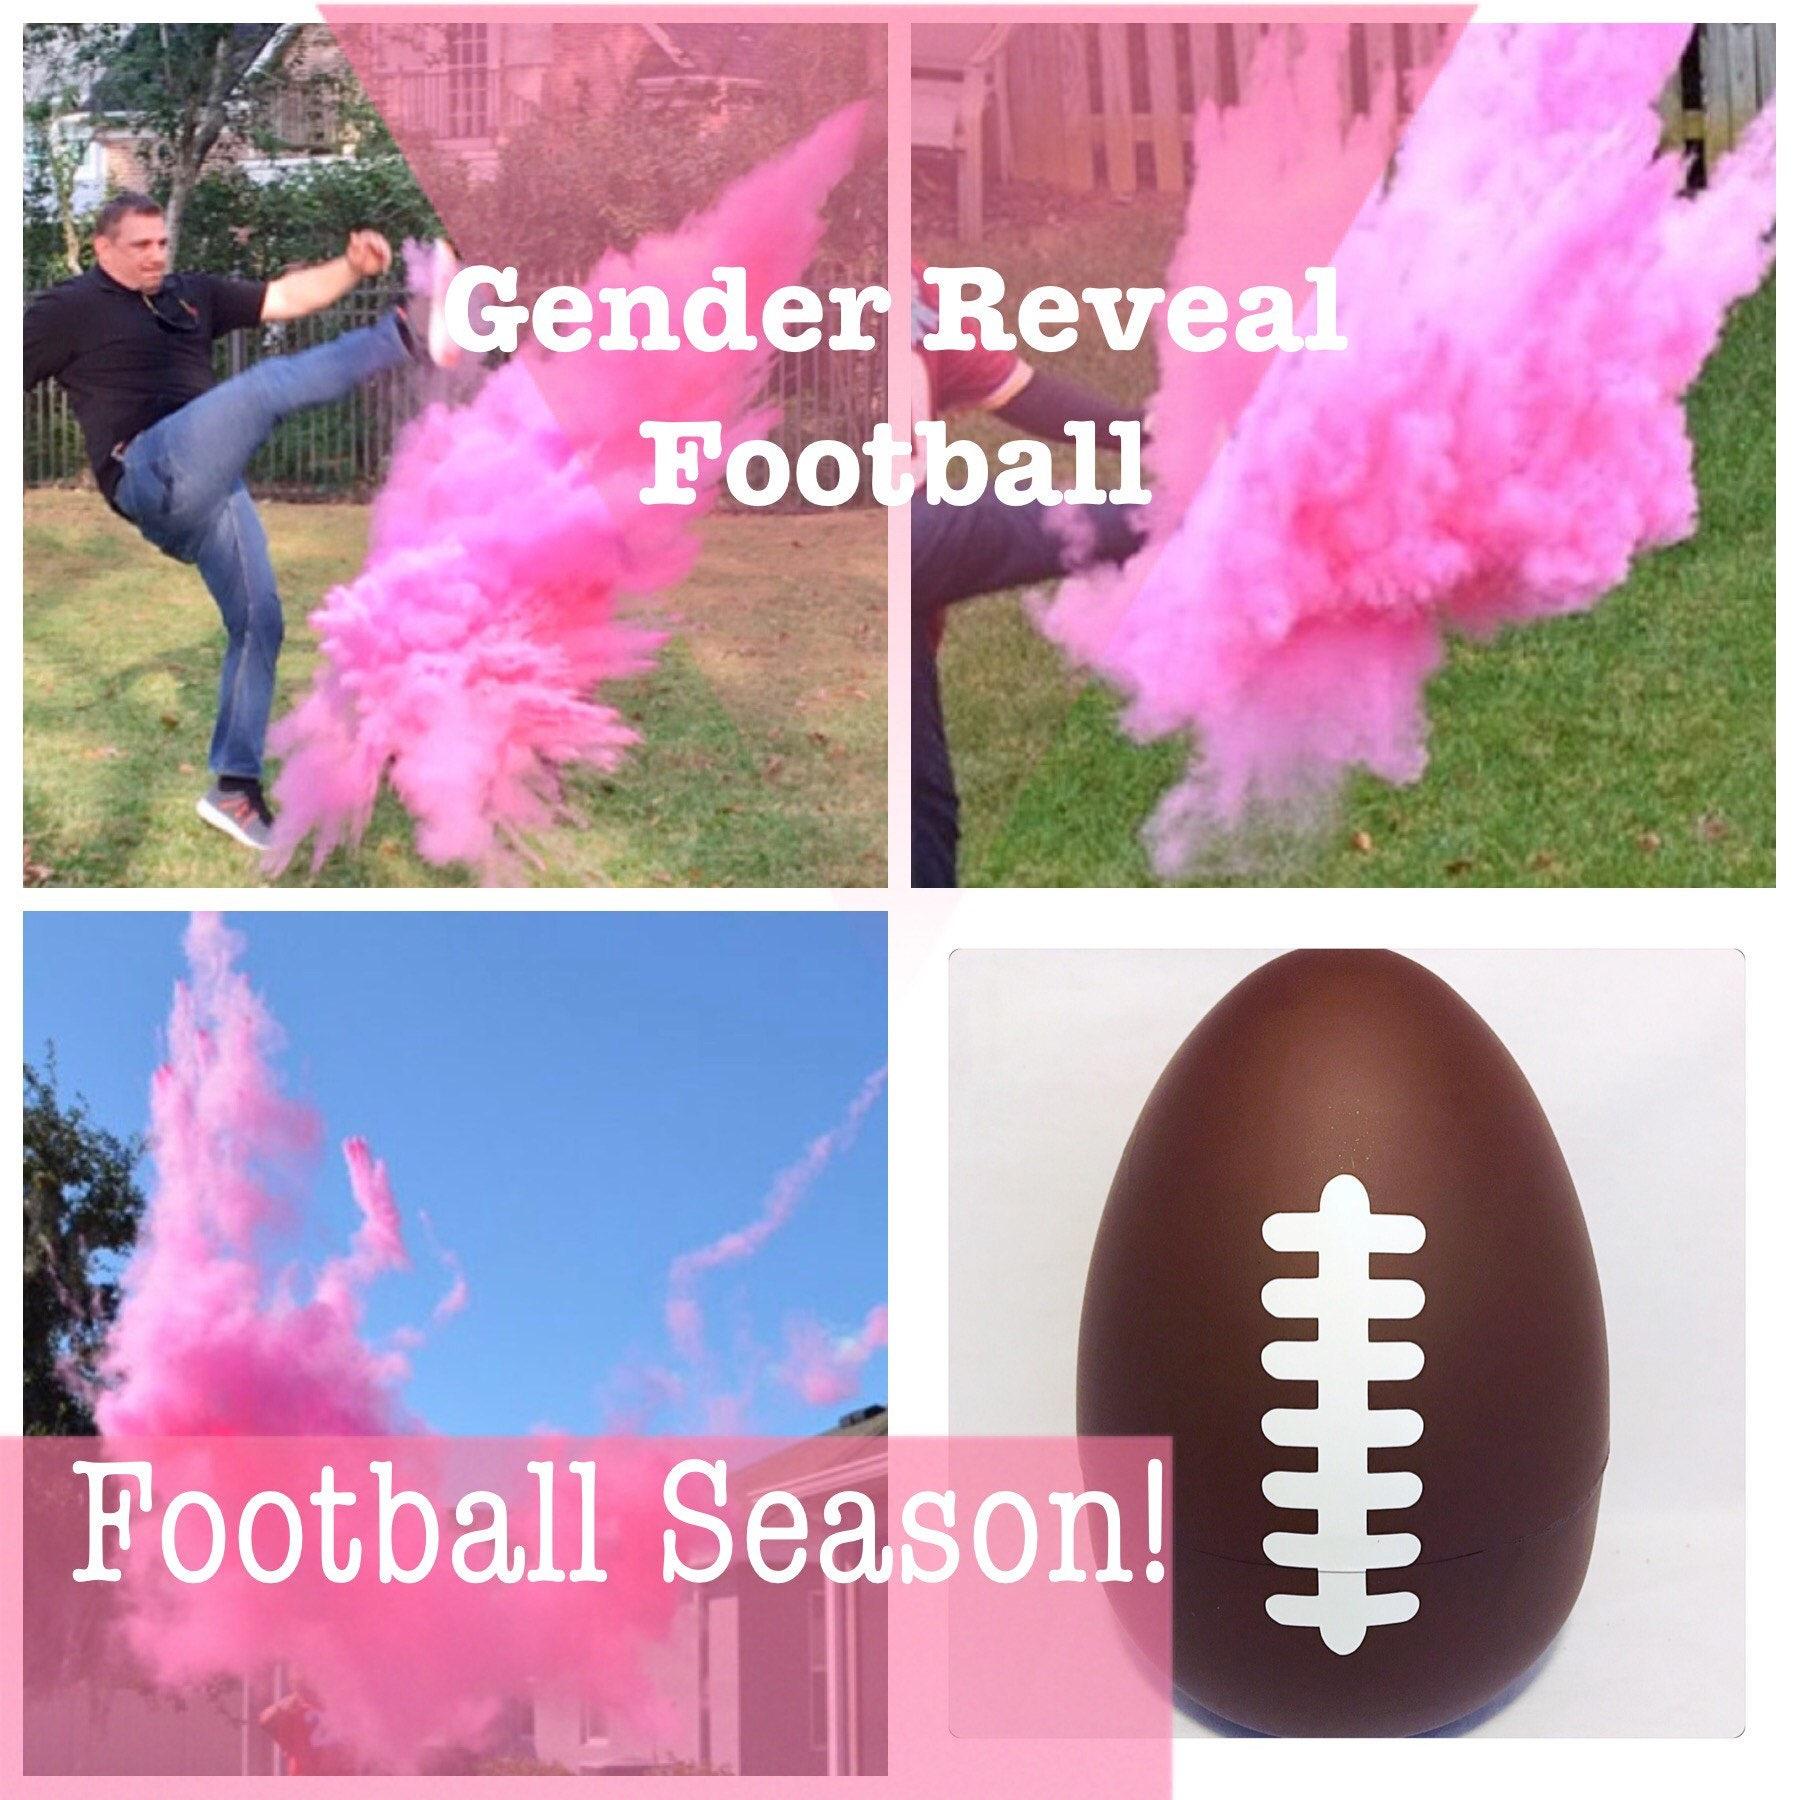 FOOTBALL Gender Reveal Ideas Football Gender Reveal Reveal   Etsy